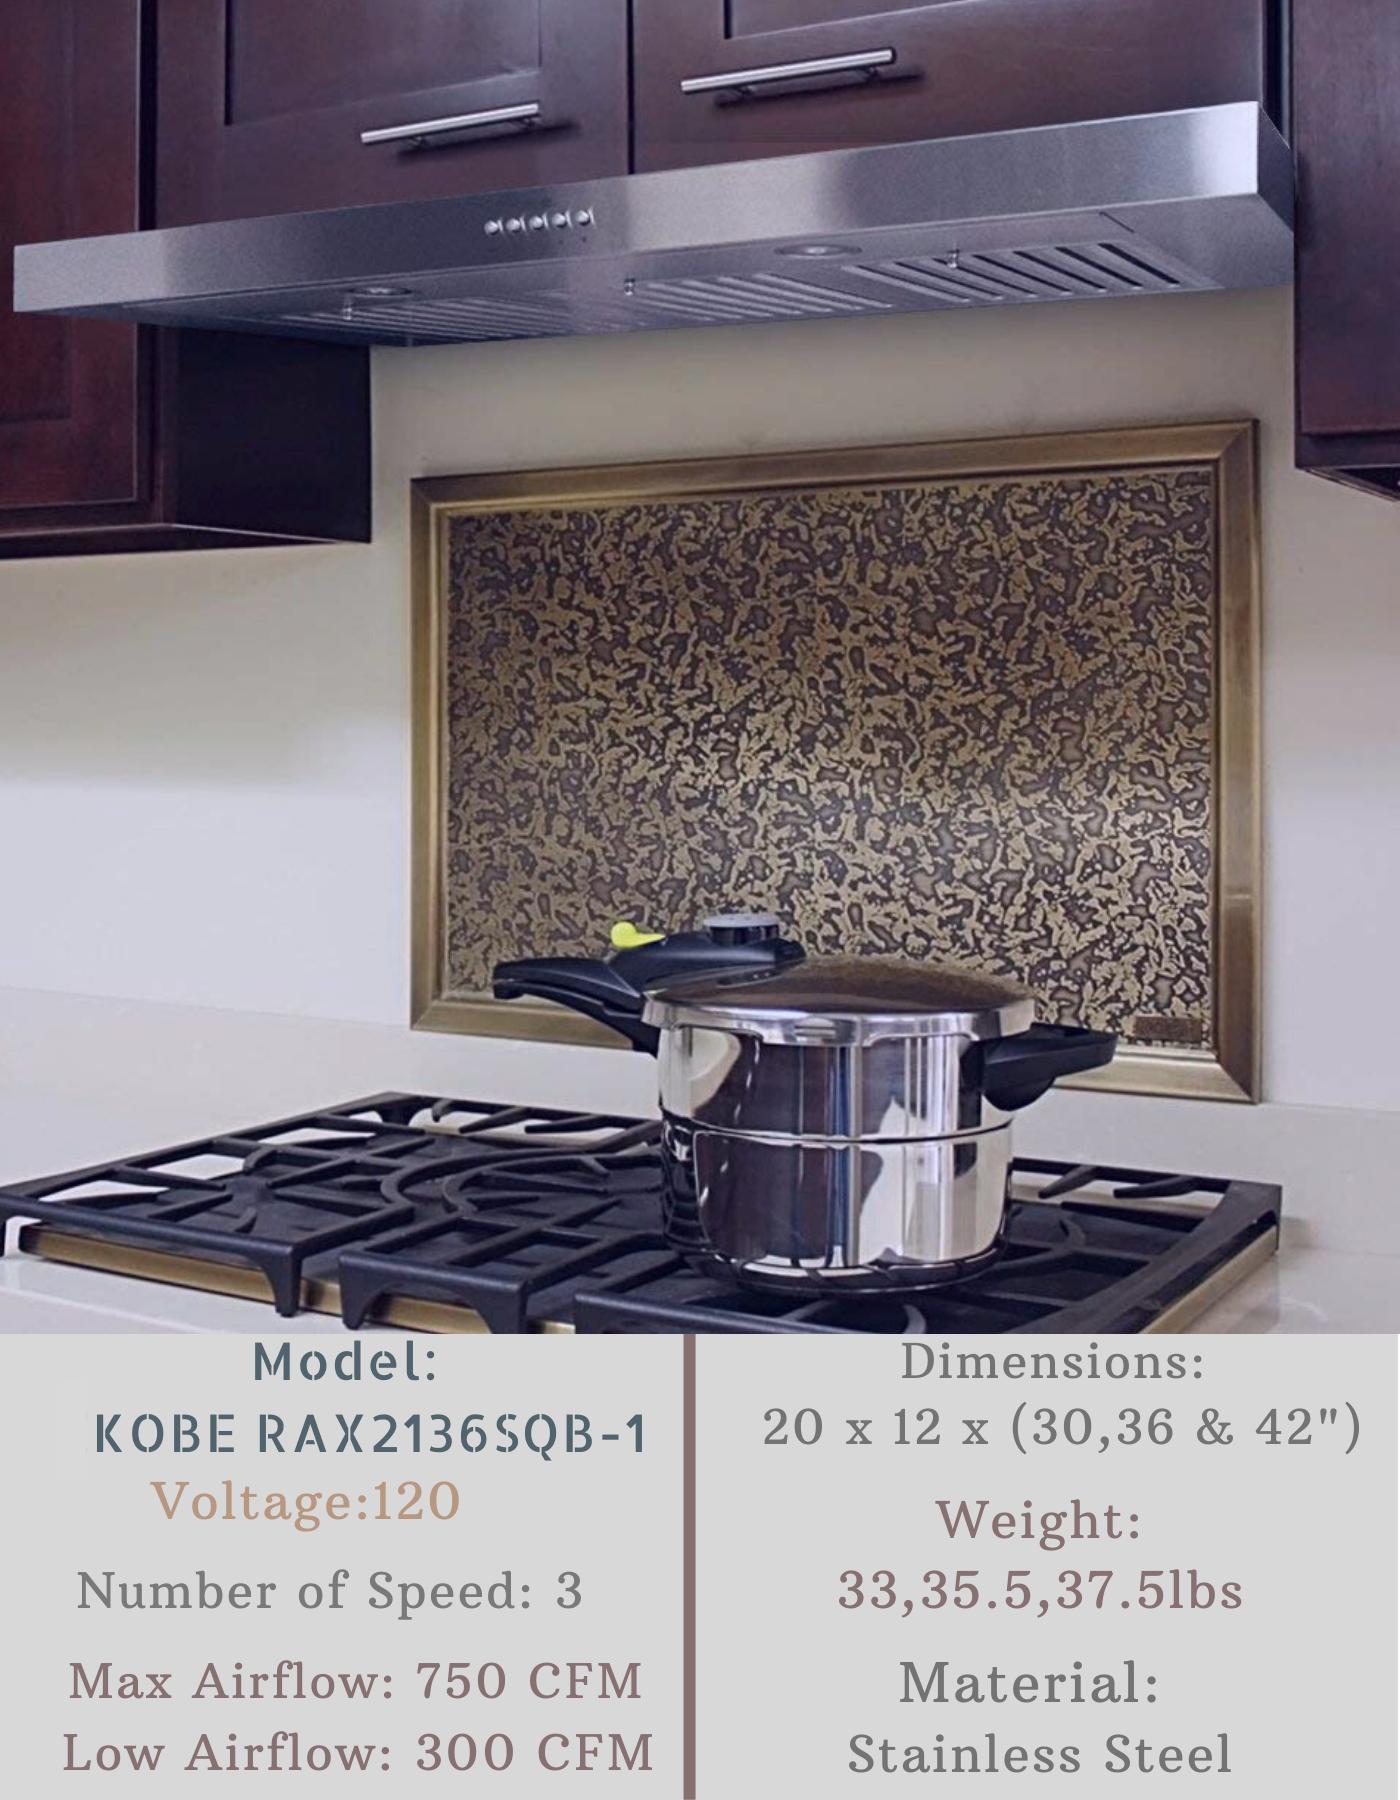 Kobe Rax2136sqb 1 Brillia Range Hood Range Hood Ductless Range Hood Medium Kitchen